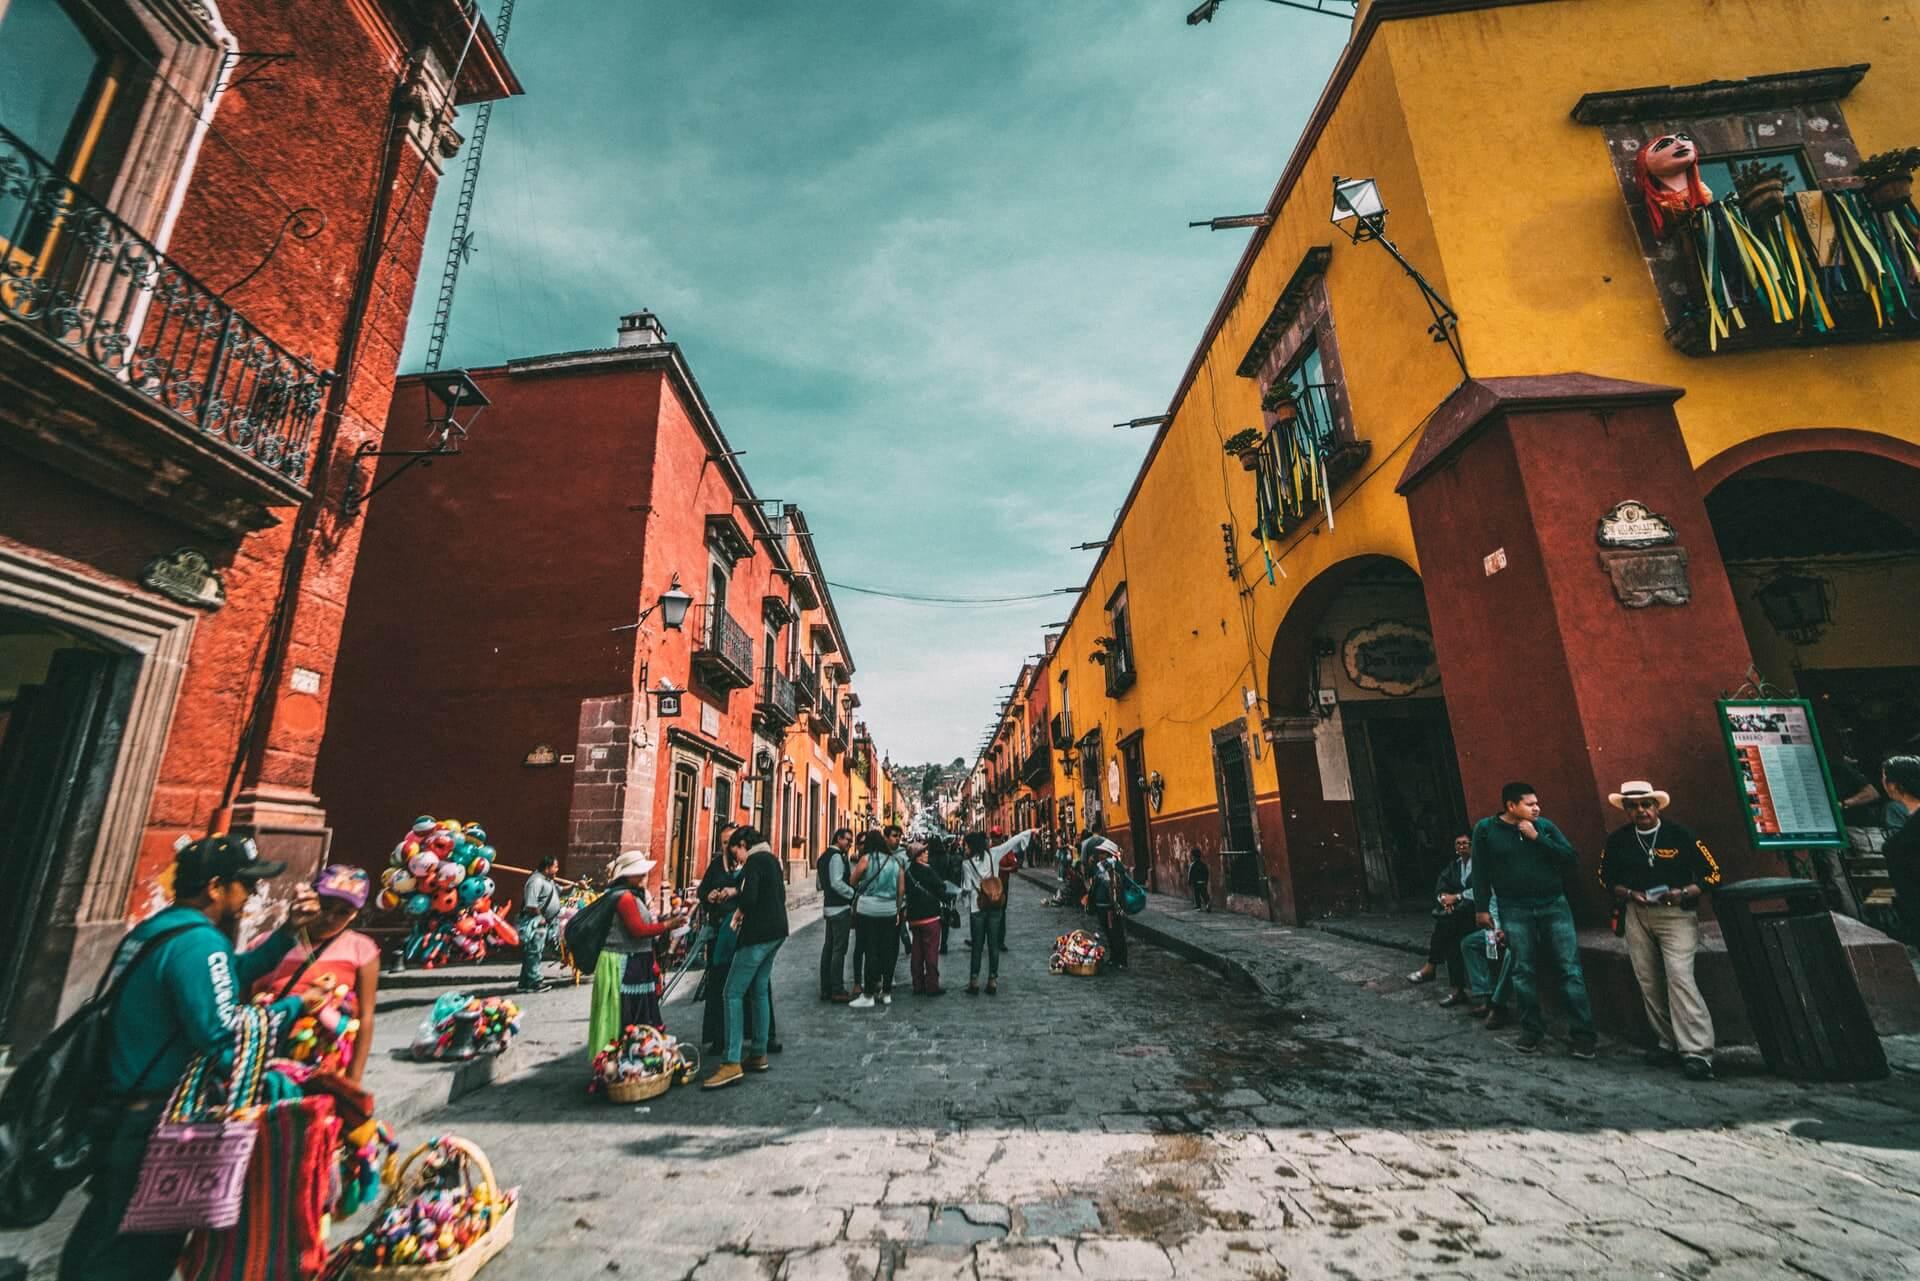 mexico-image.jpg